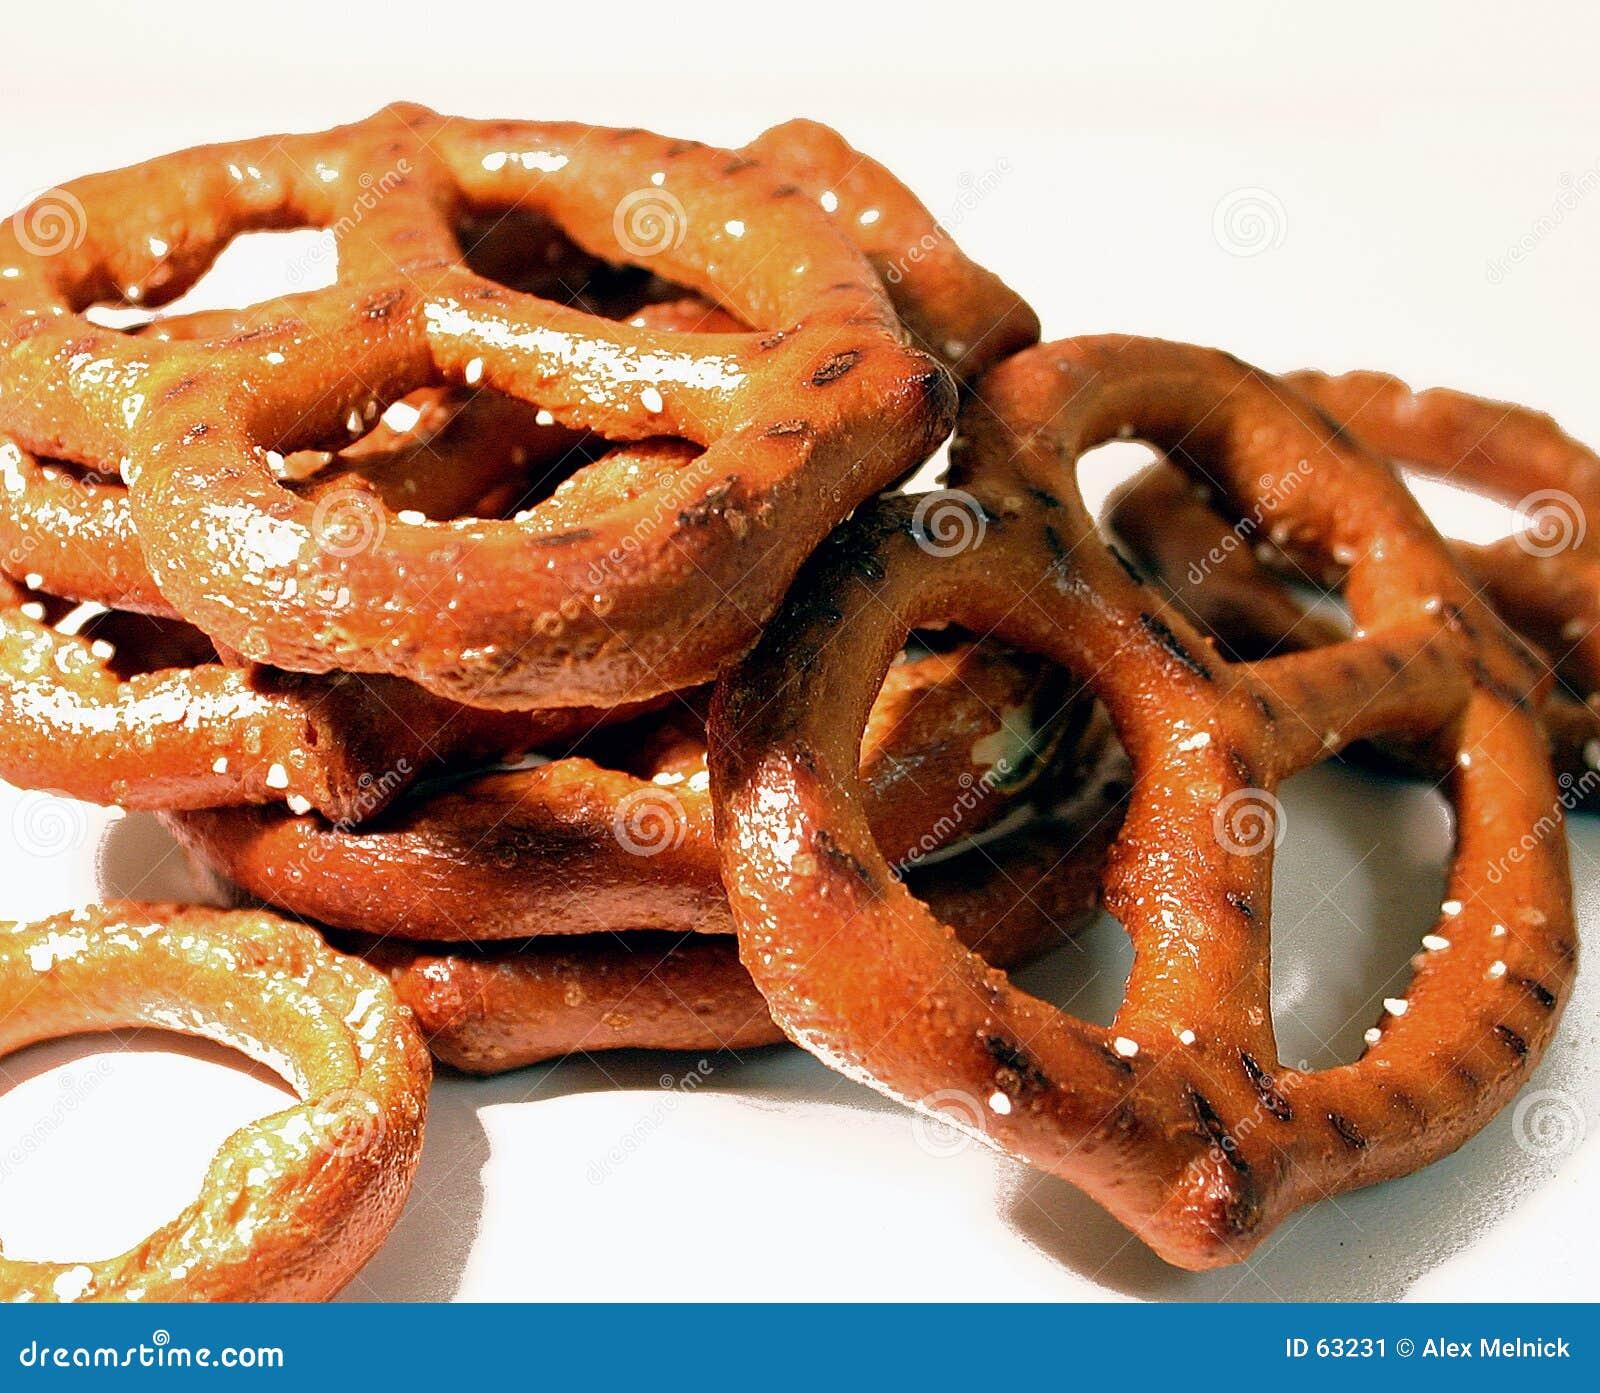 Download Pretzels image stock. Image du nourriture, groupe, instruction - 63231